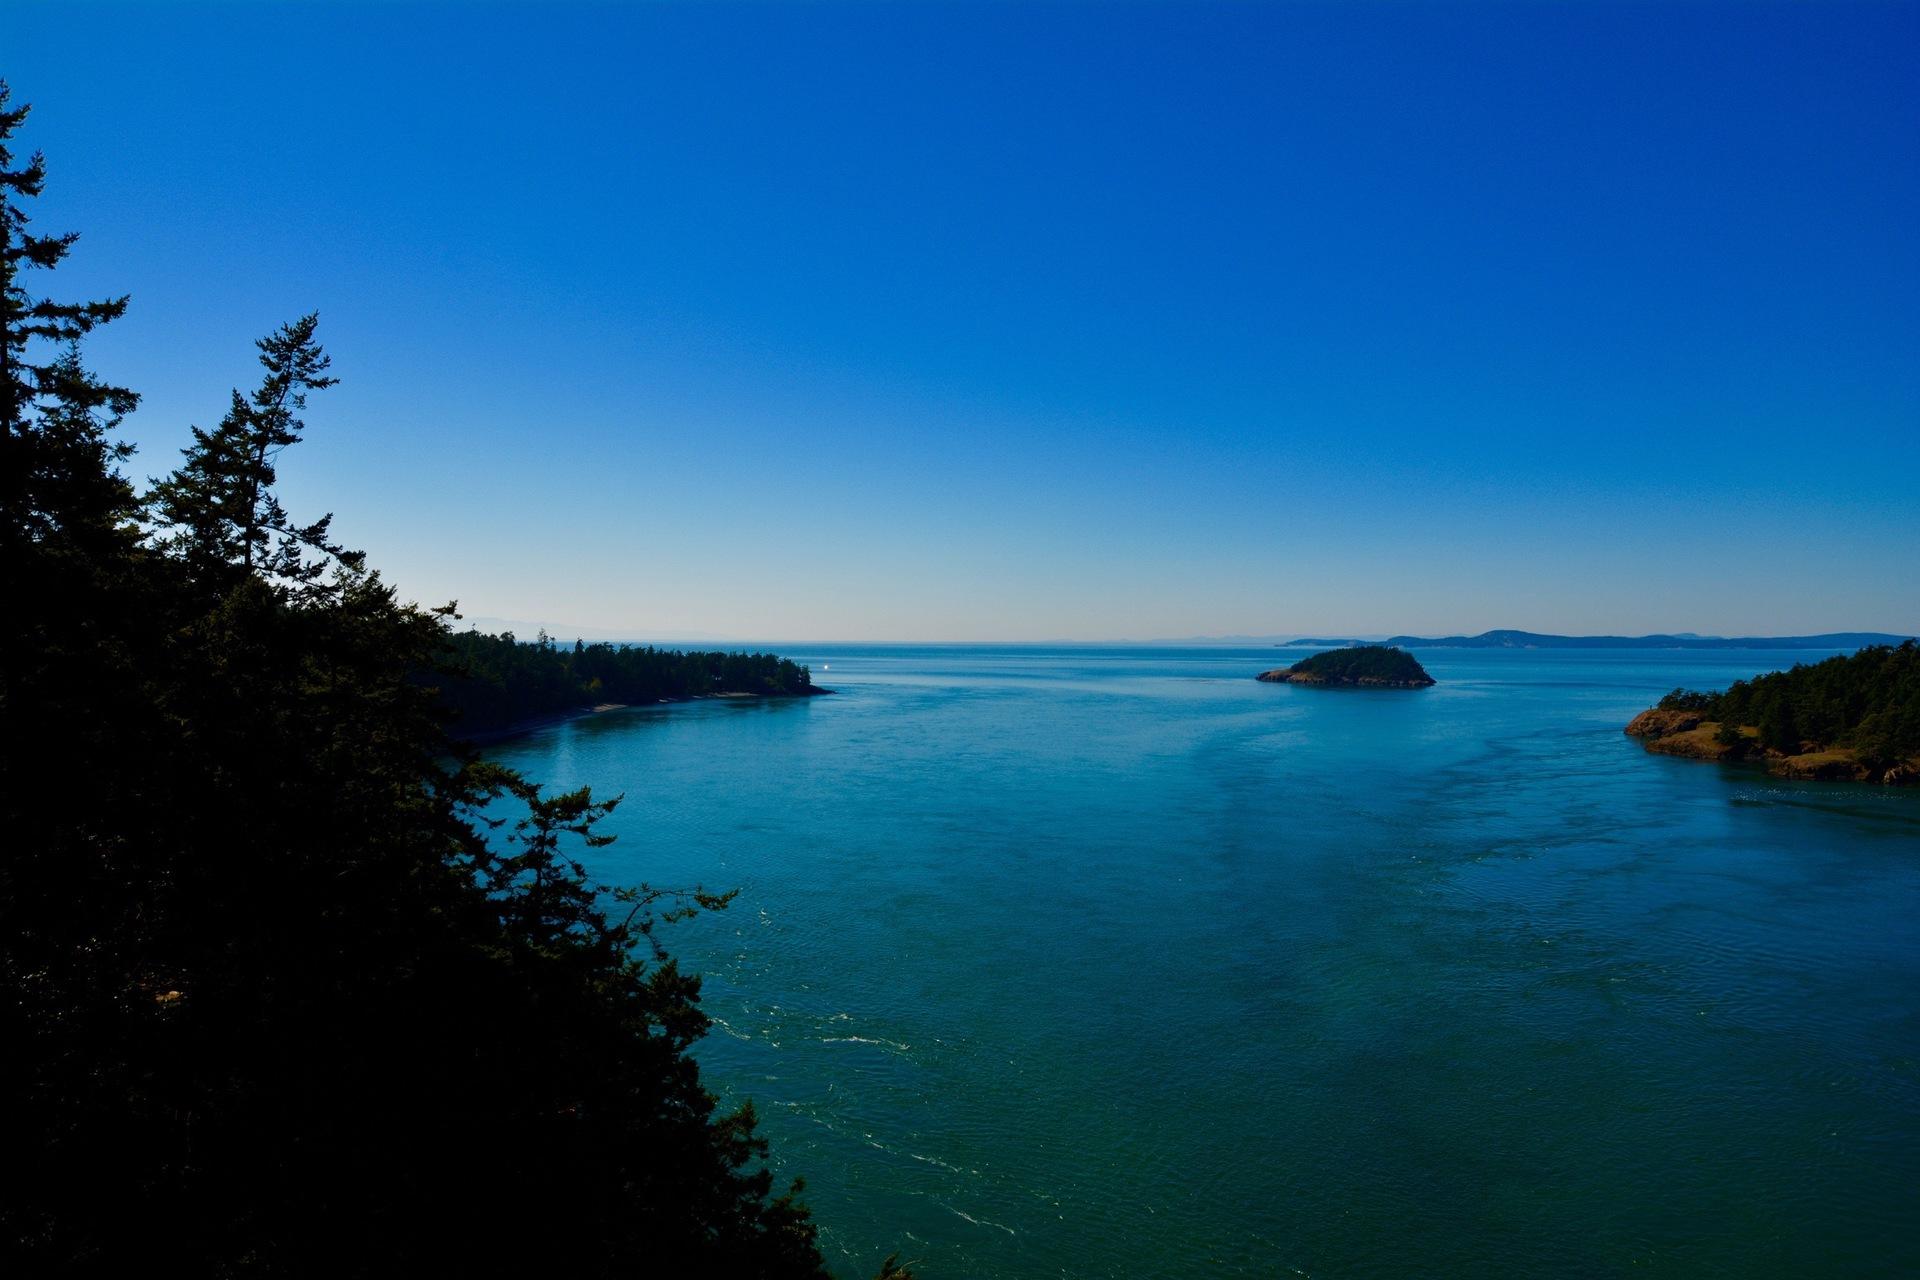 Pacific Northwest Sunset | mbocast, beach, coast, island